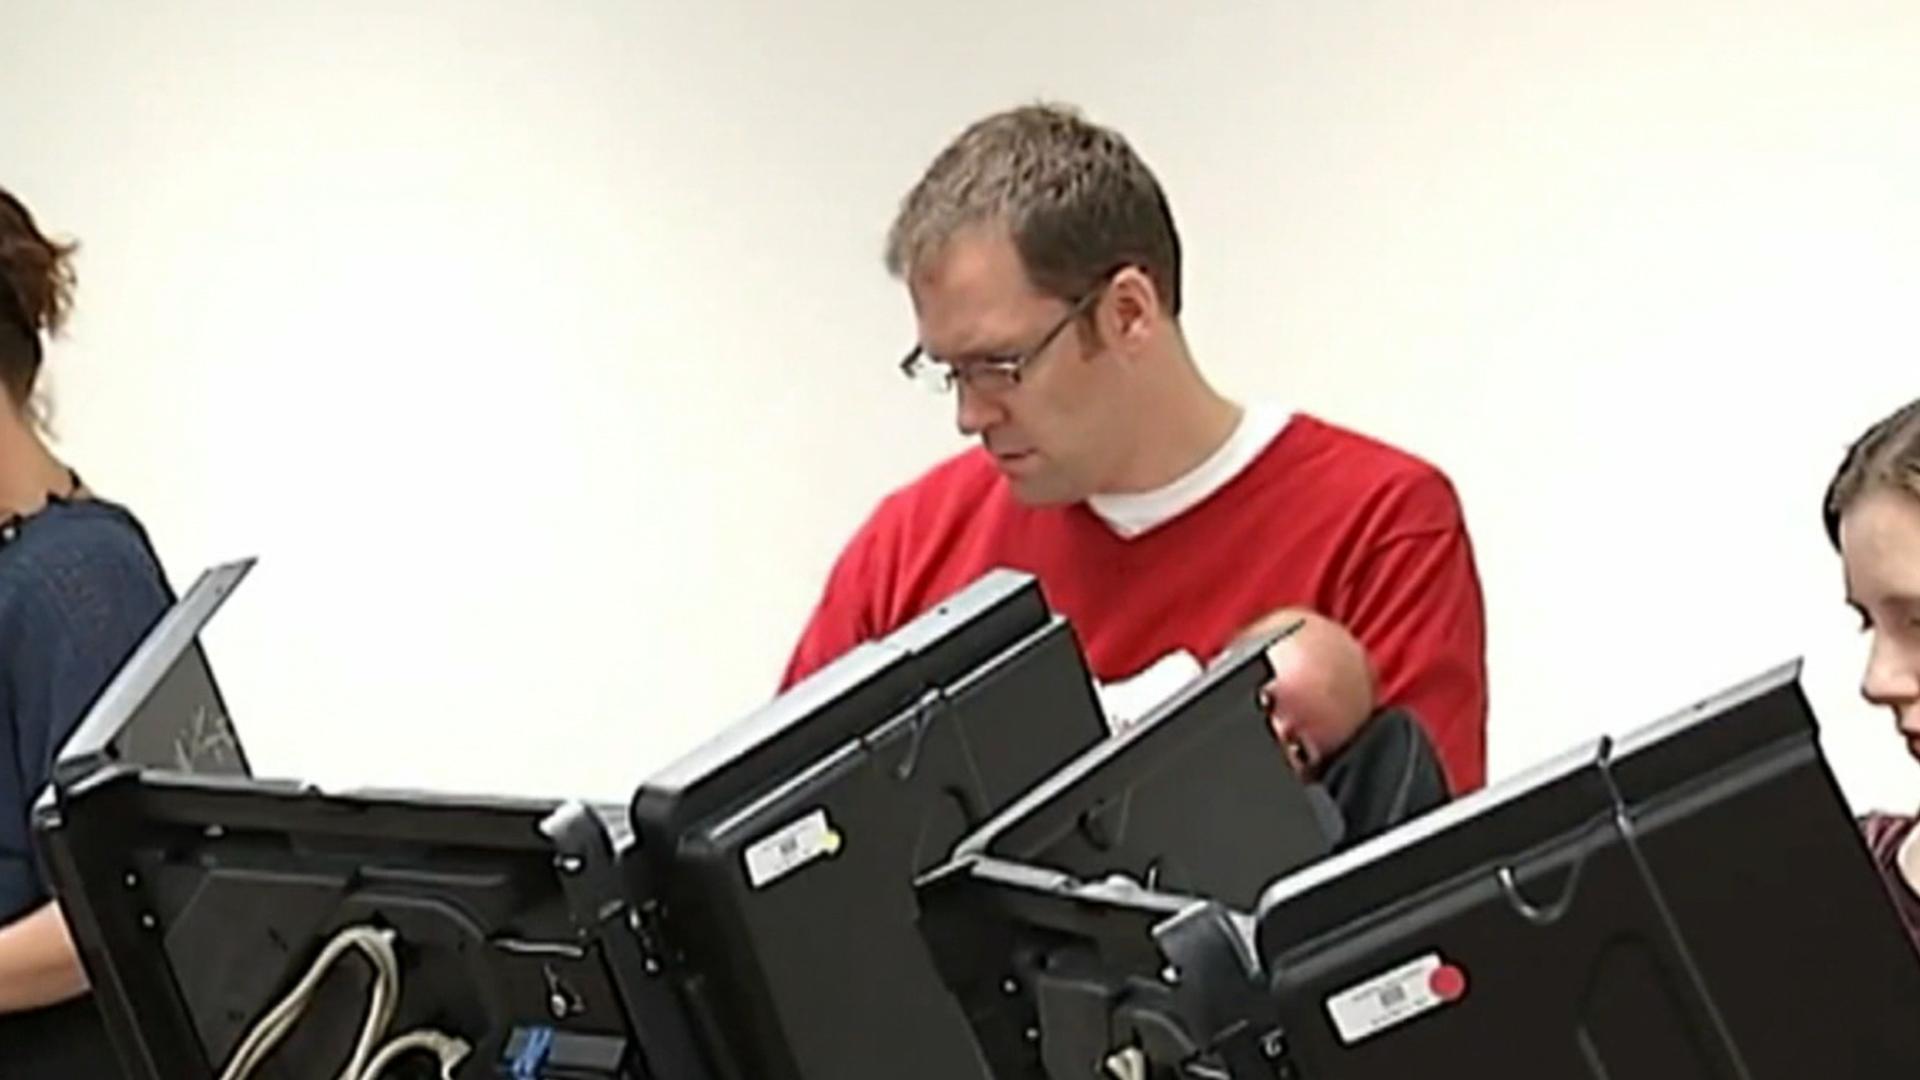 Dems challenge Ohio voting restrictions